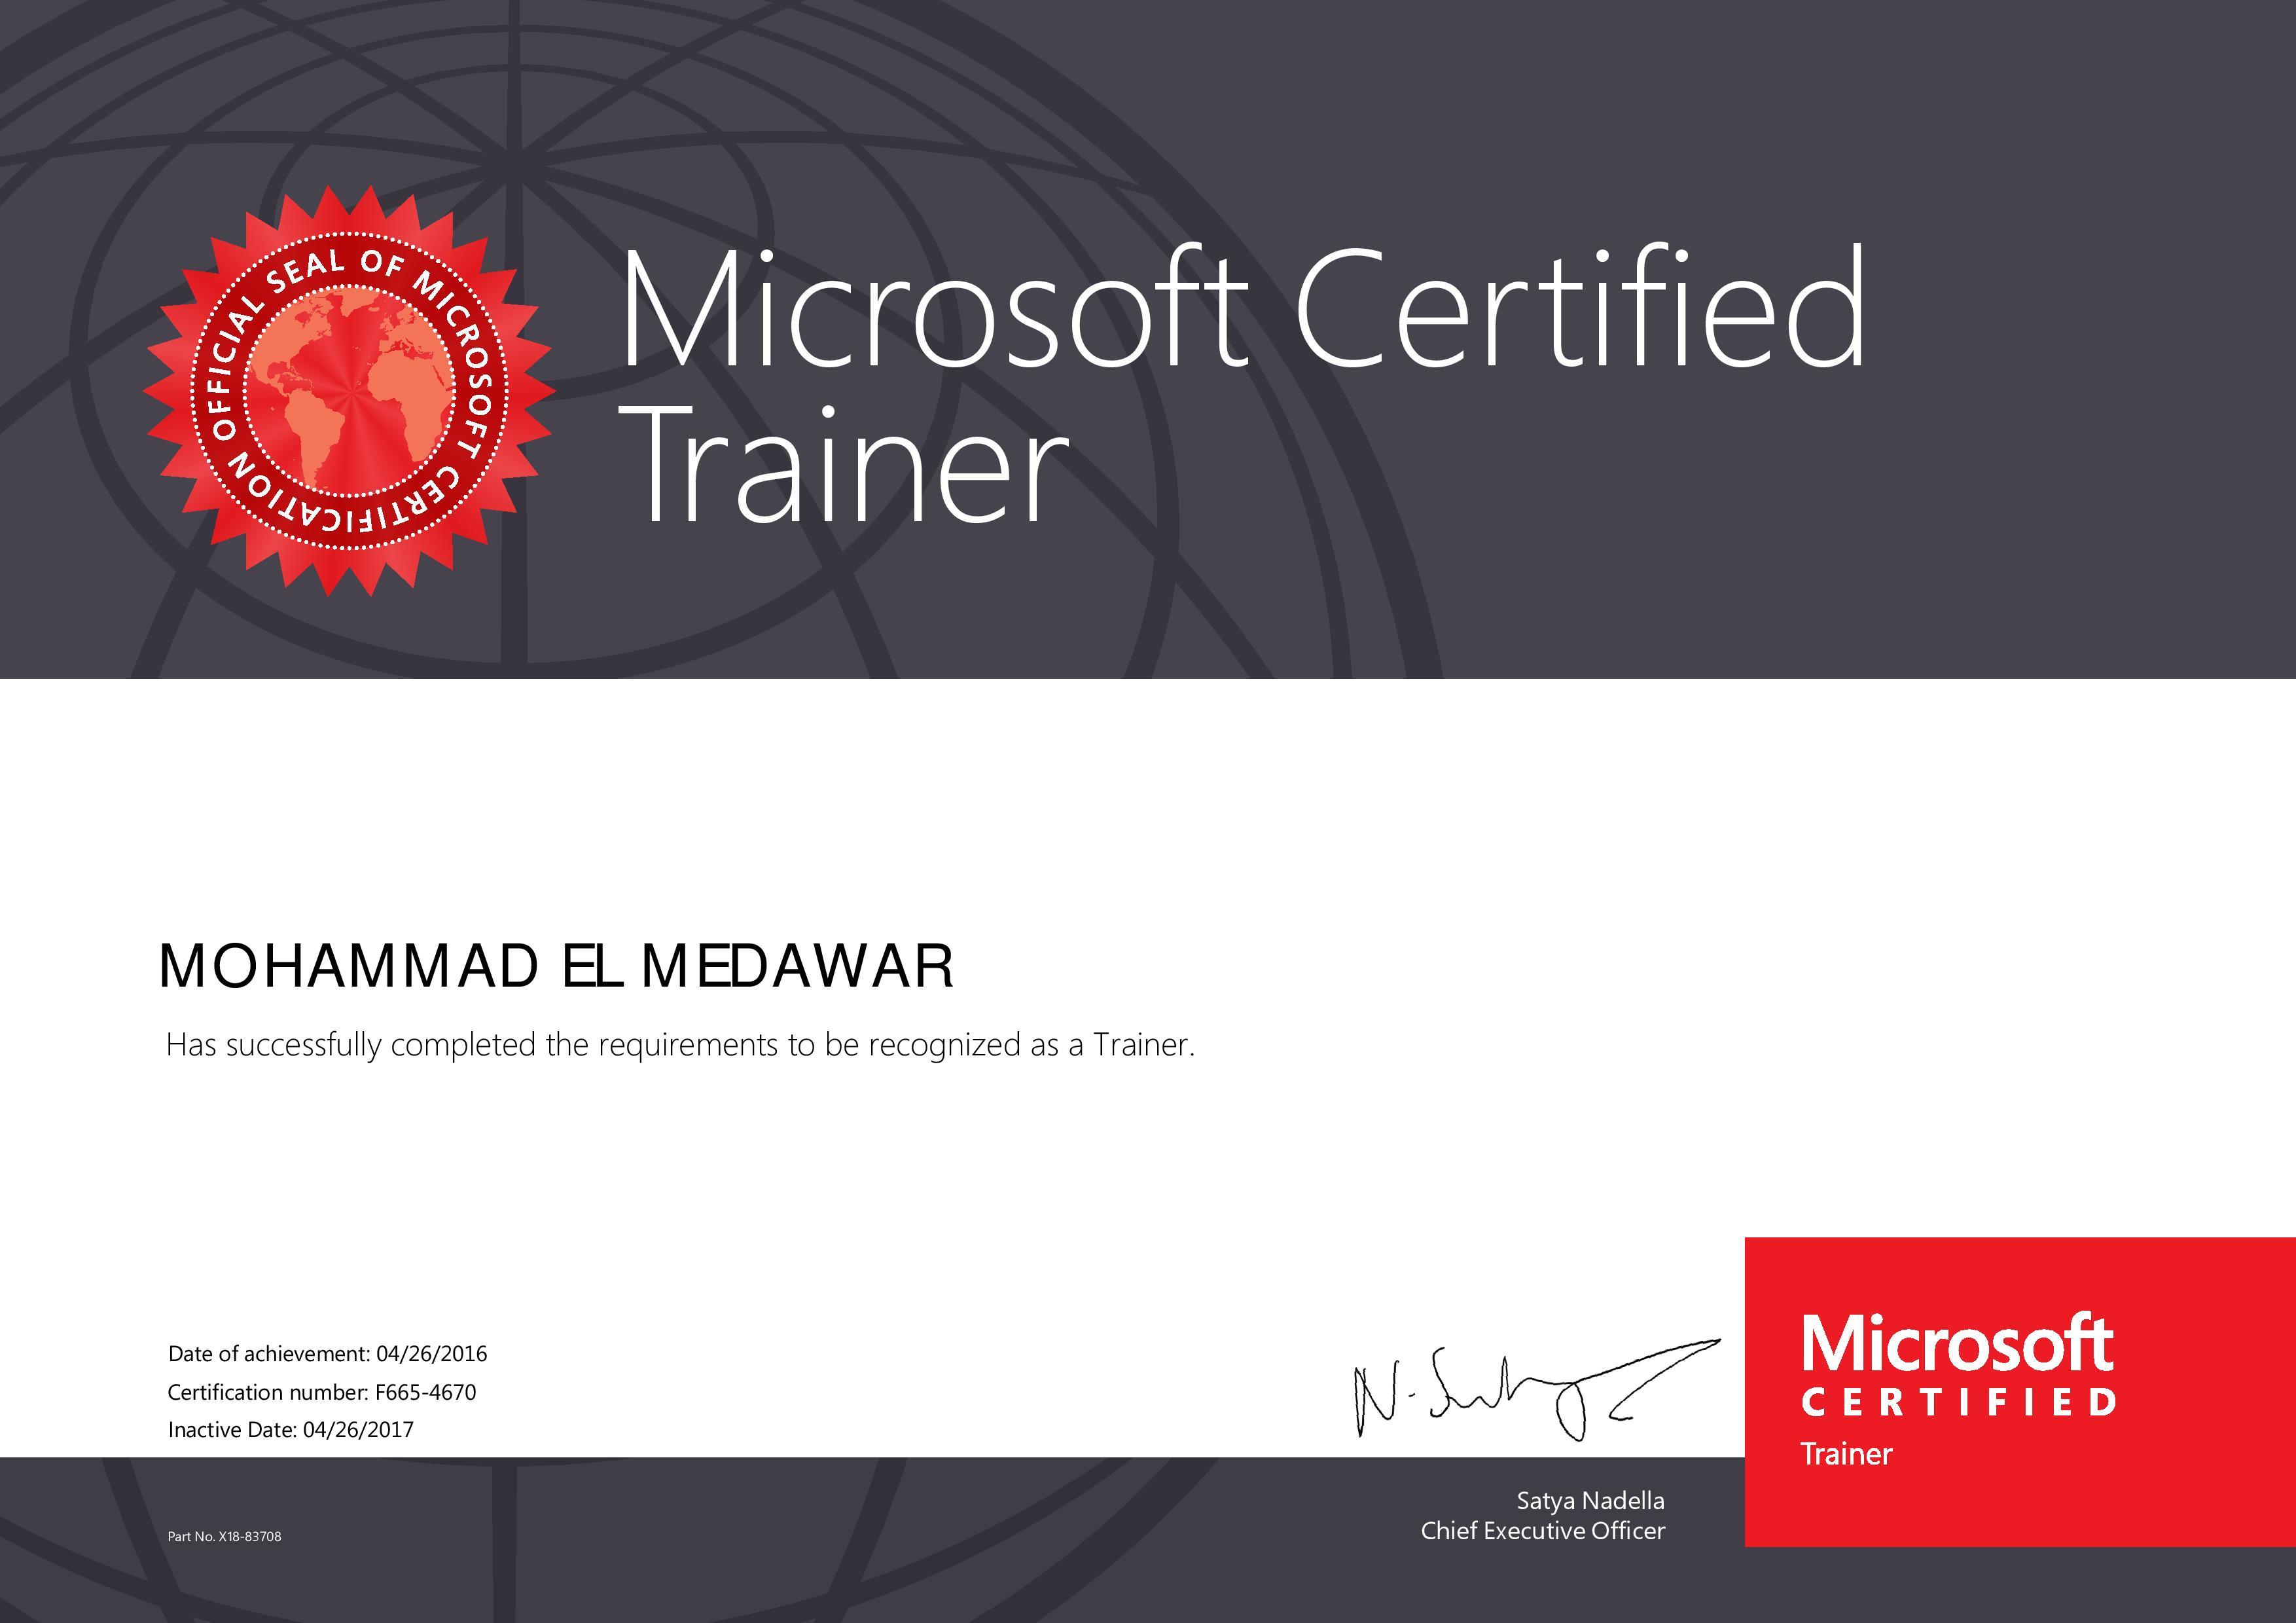 Mohammad el medawar training professional consultant visualcv degrees certificates microsoft certified trainer xflitez Gallery